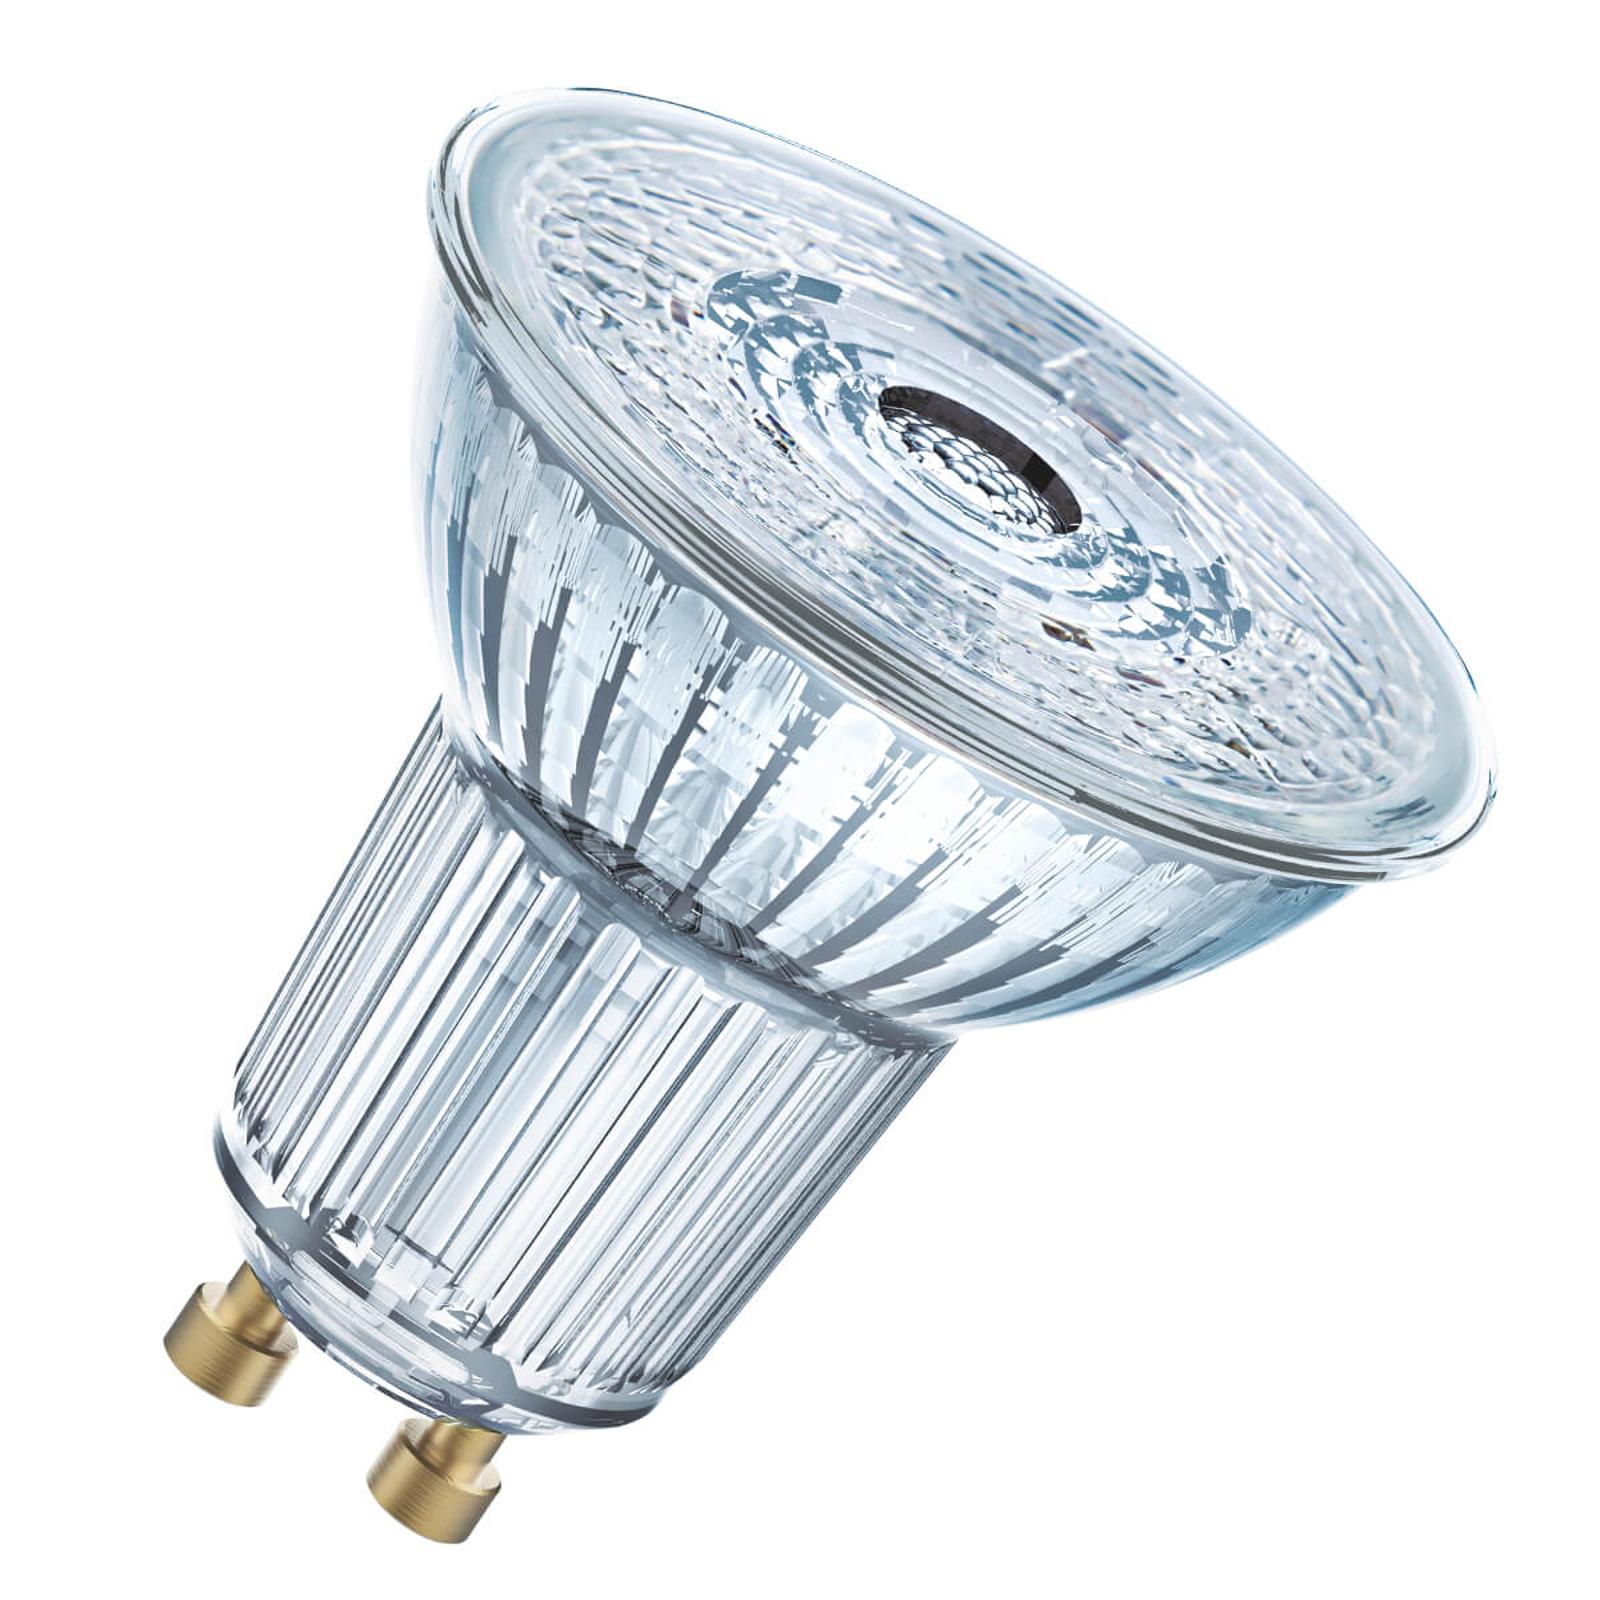 LED reflectorlamp GU10 4,3W, 350 lumen, set van 3